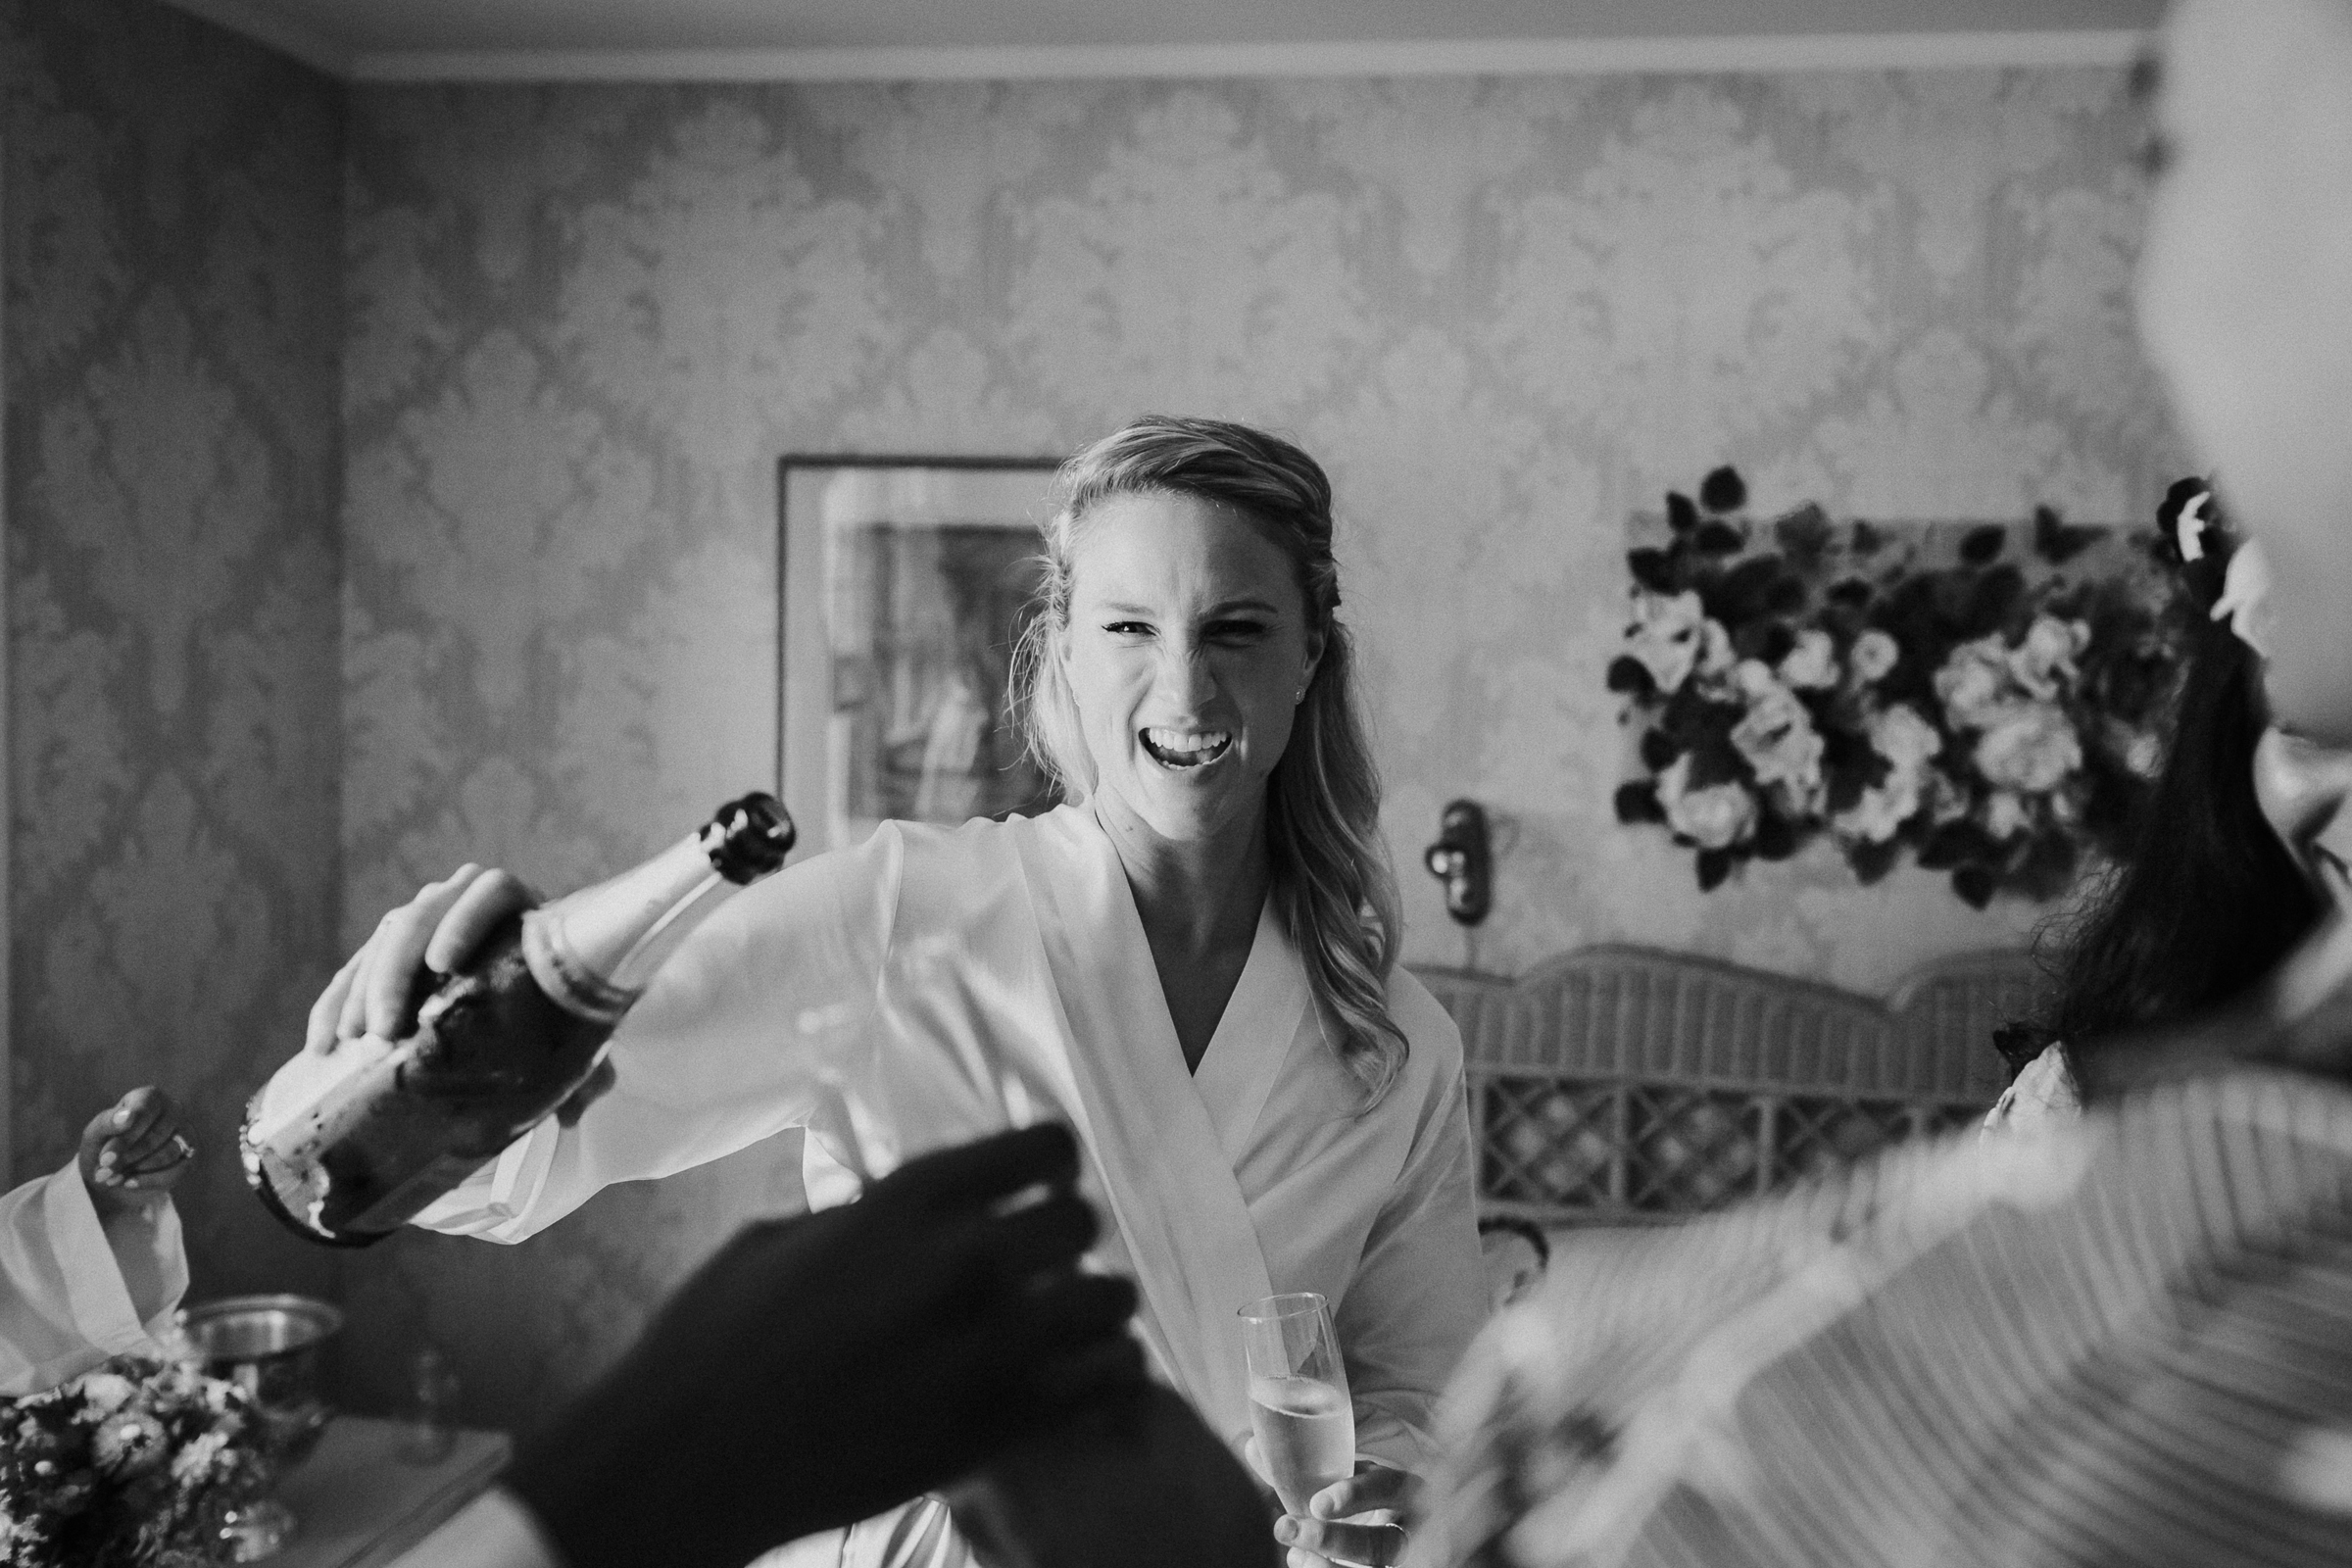 Backyard-Intimate-Adventurous-Destination-Wedding-Darien-Connecticut-Documentary-Wedding-Photography-16.jpg